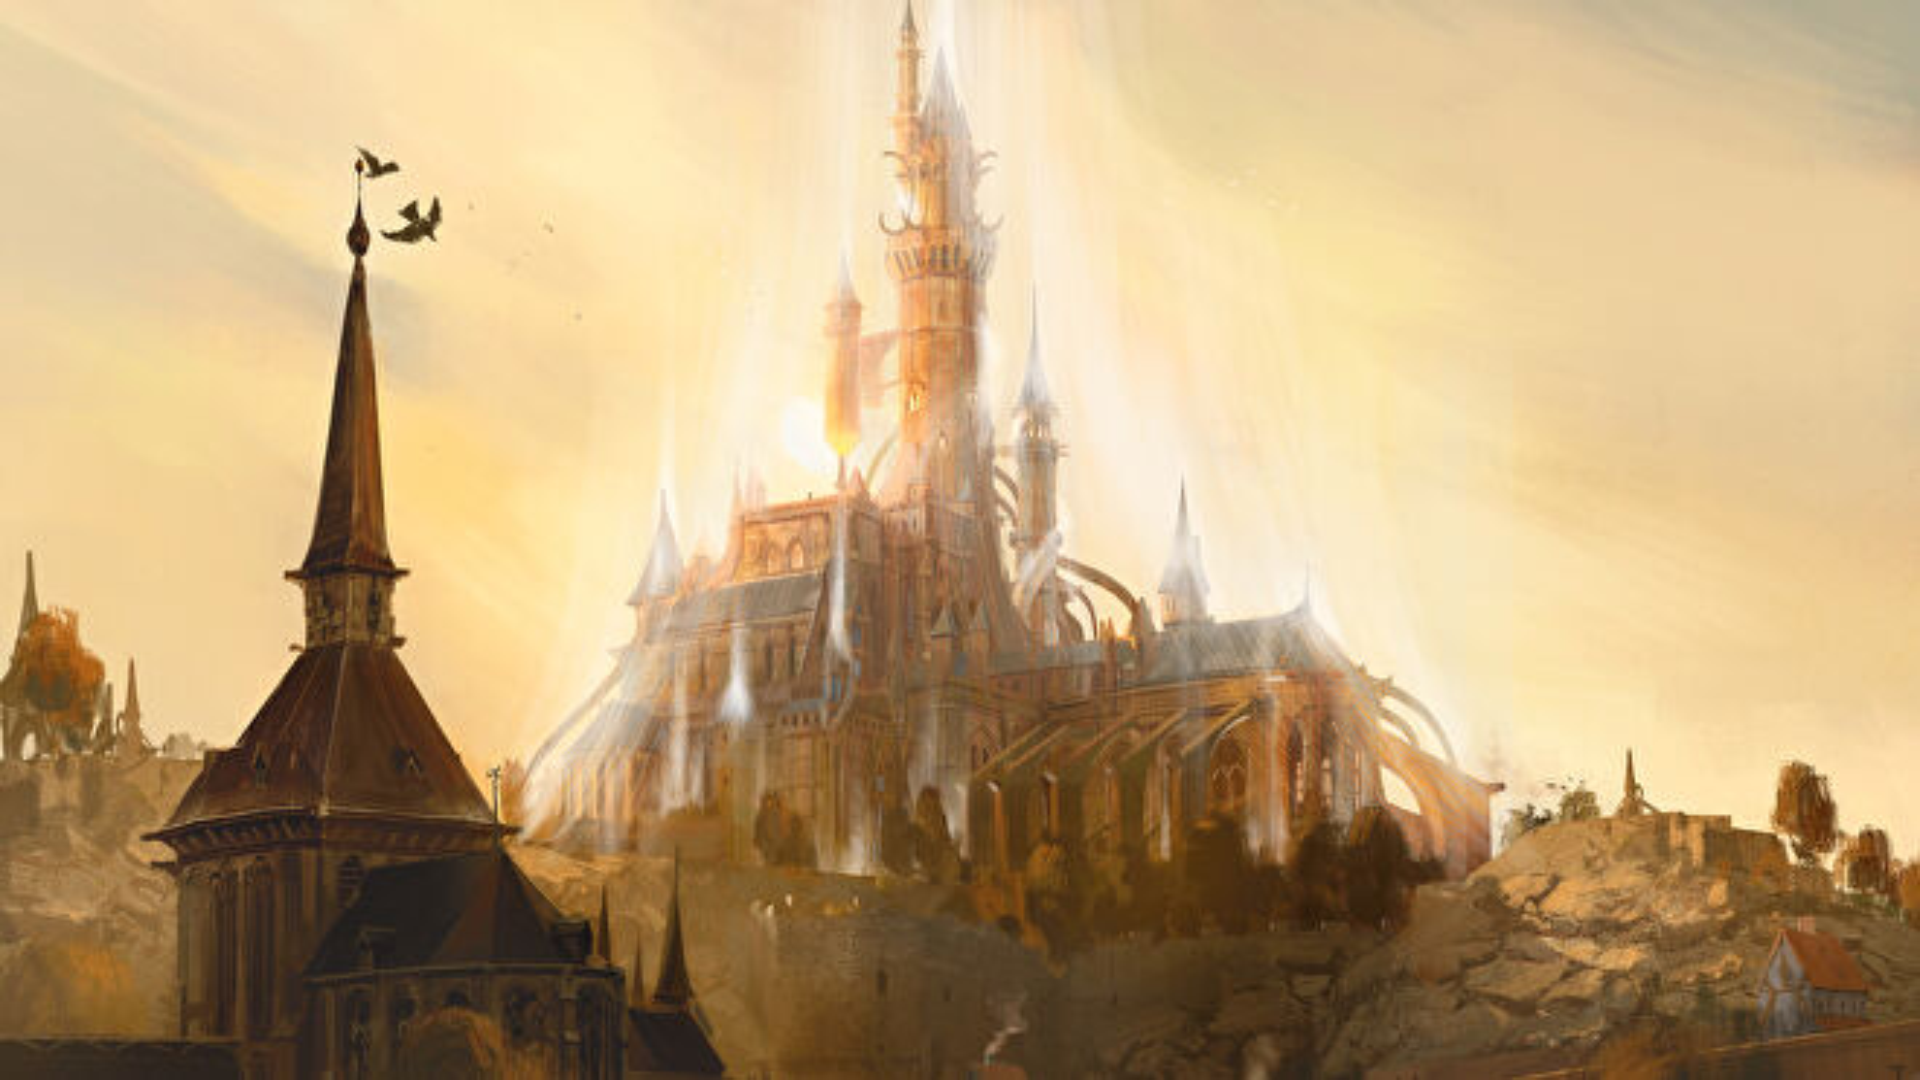 Dungeons & Dragons Eberron artwork landscape